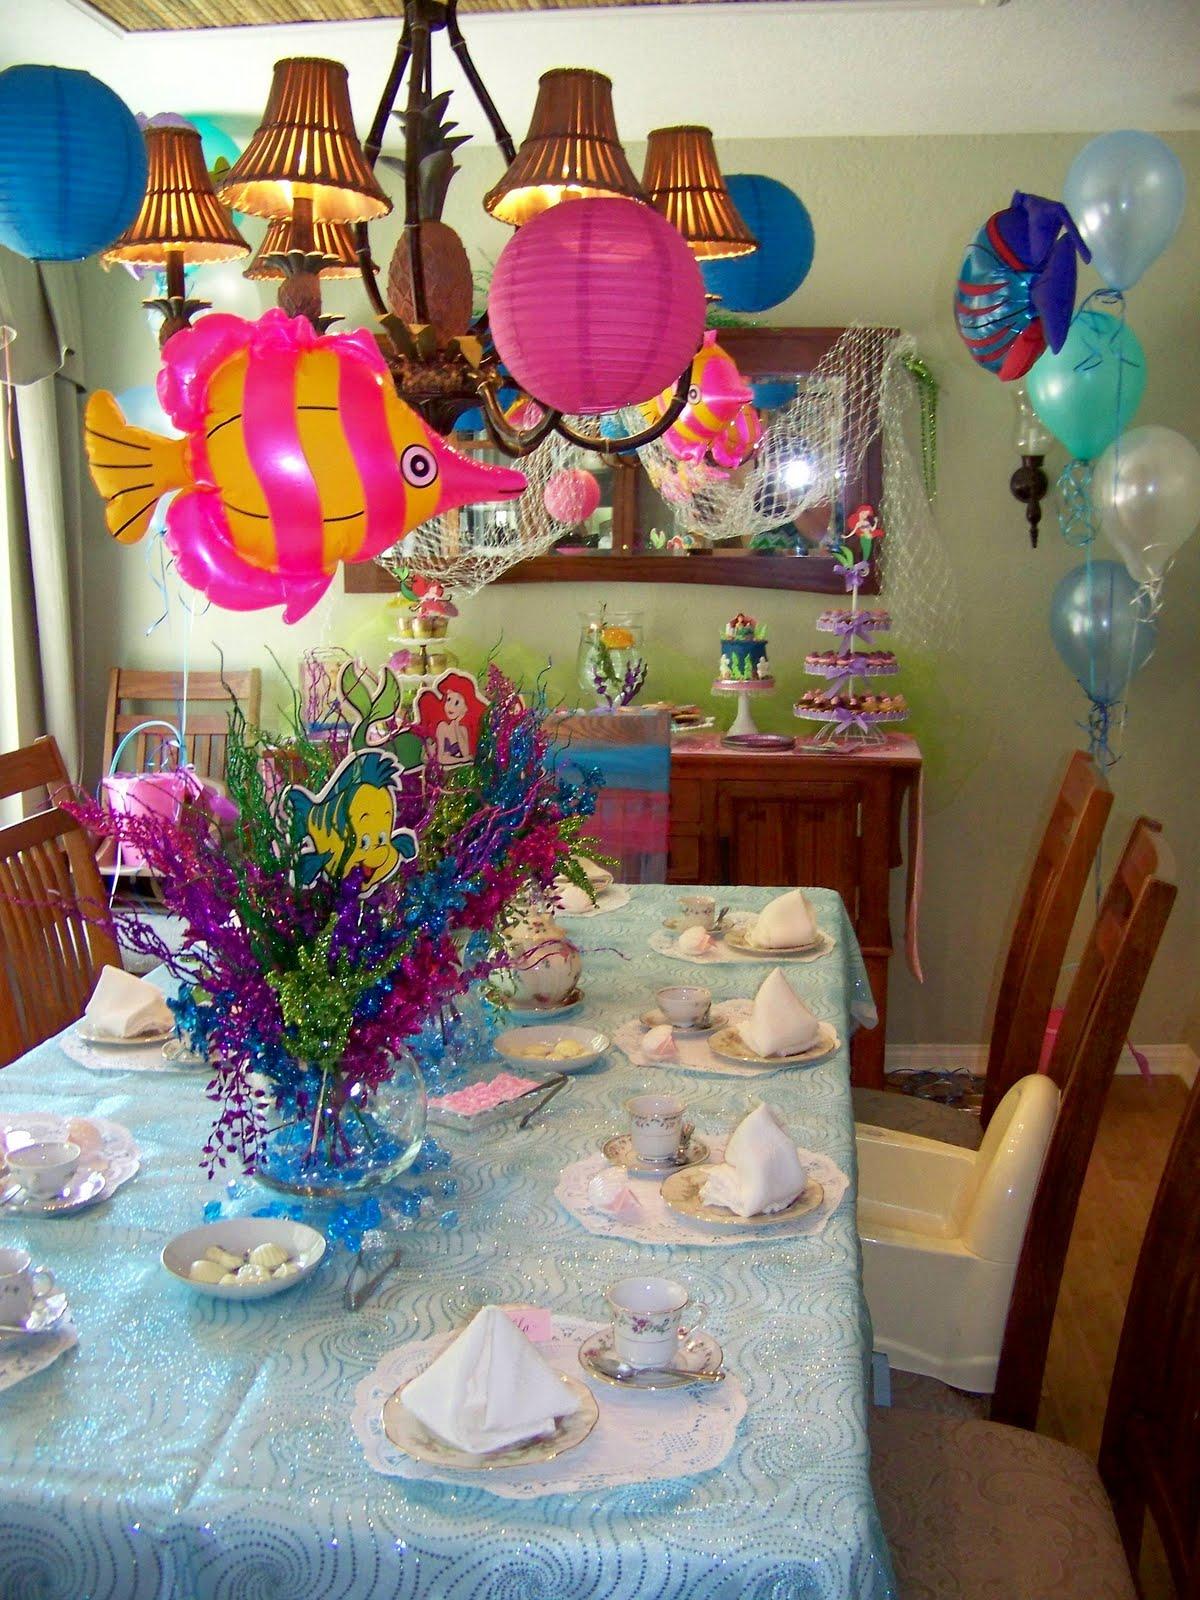 Plumeria cake studio under the sea tea party for Ariel decoration party